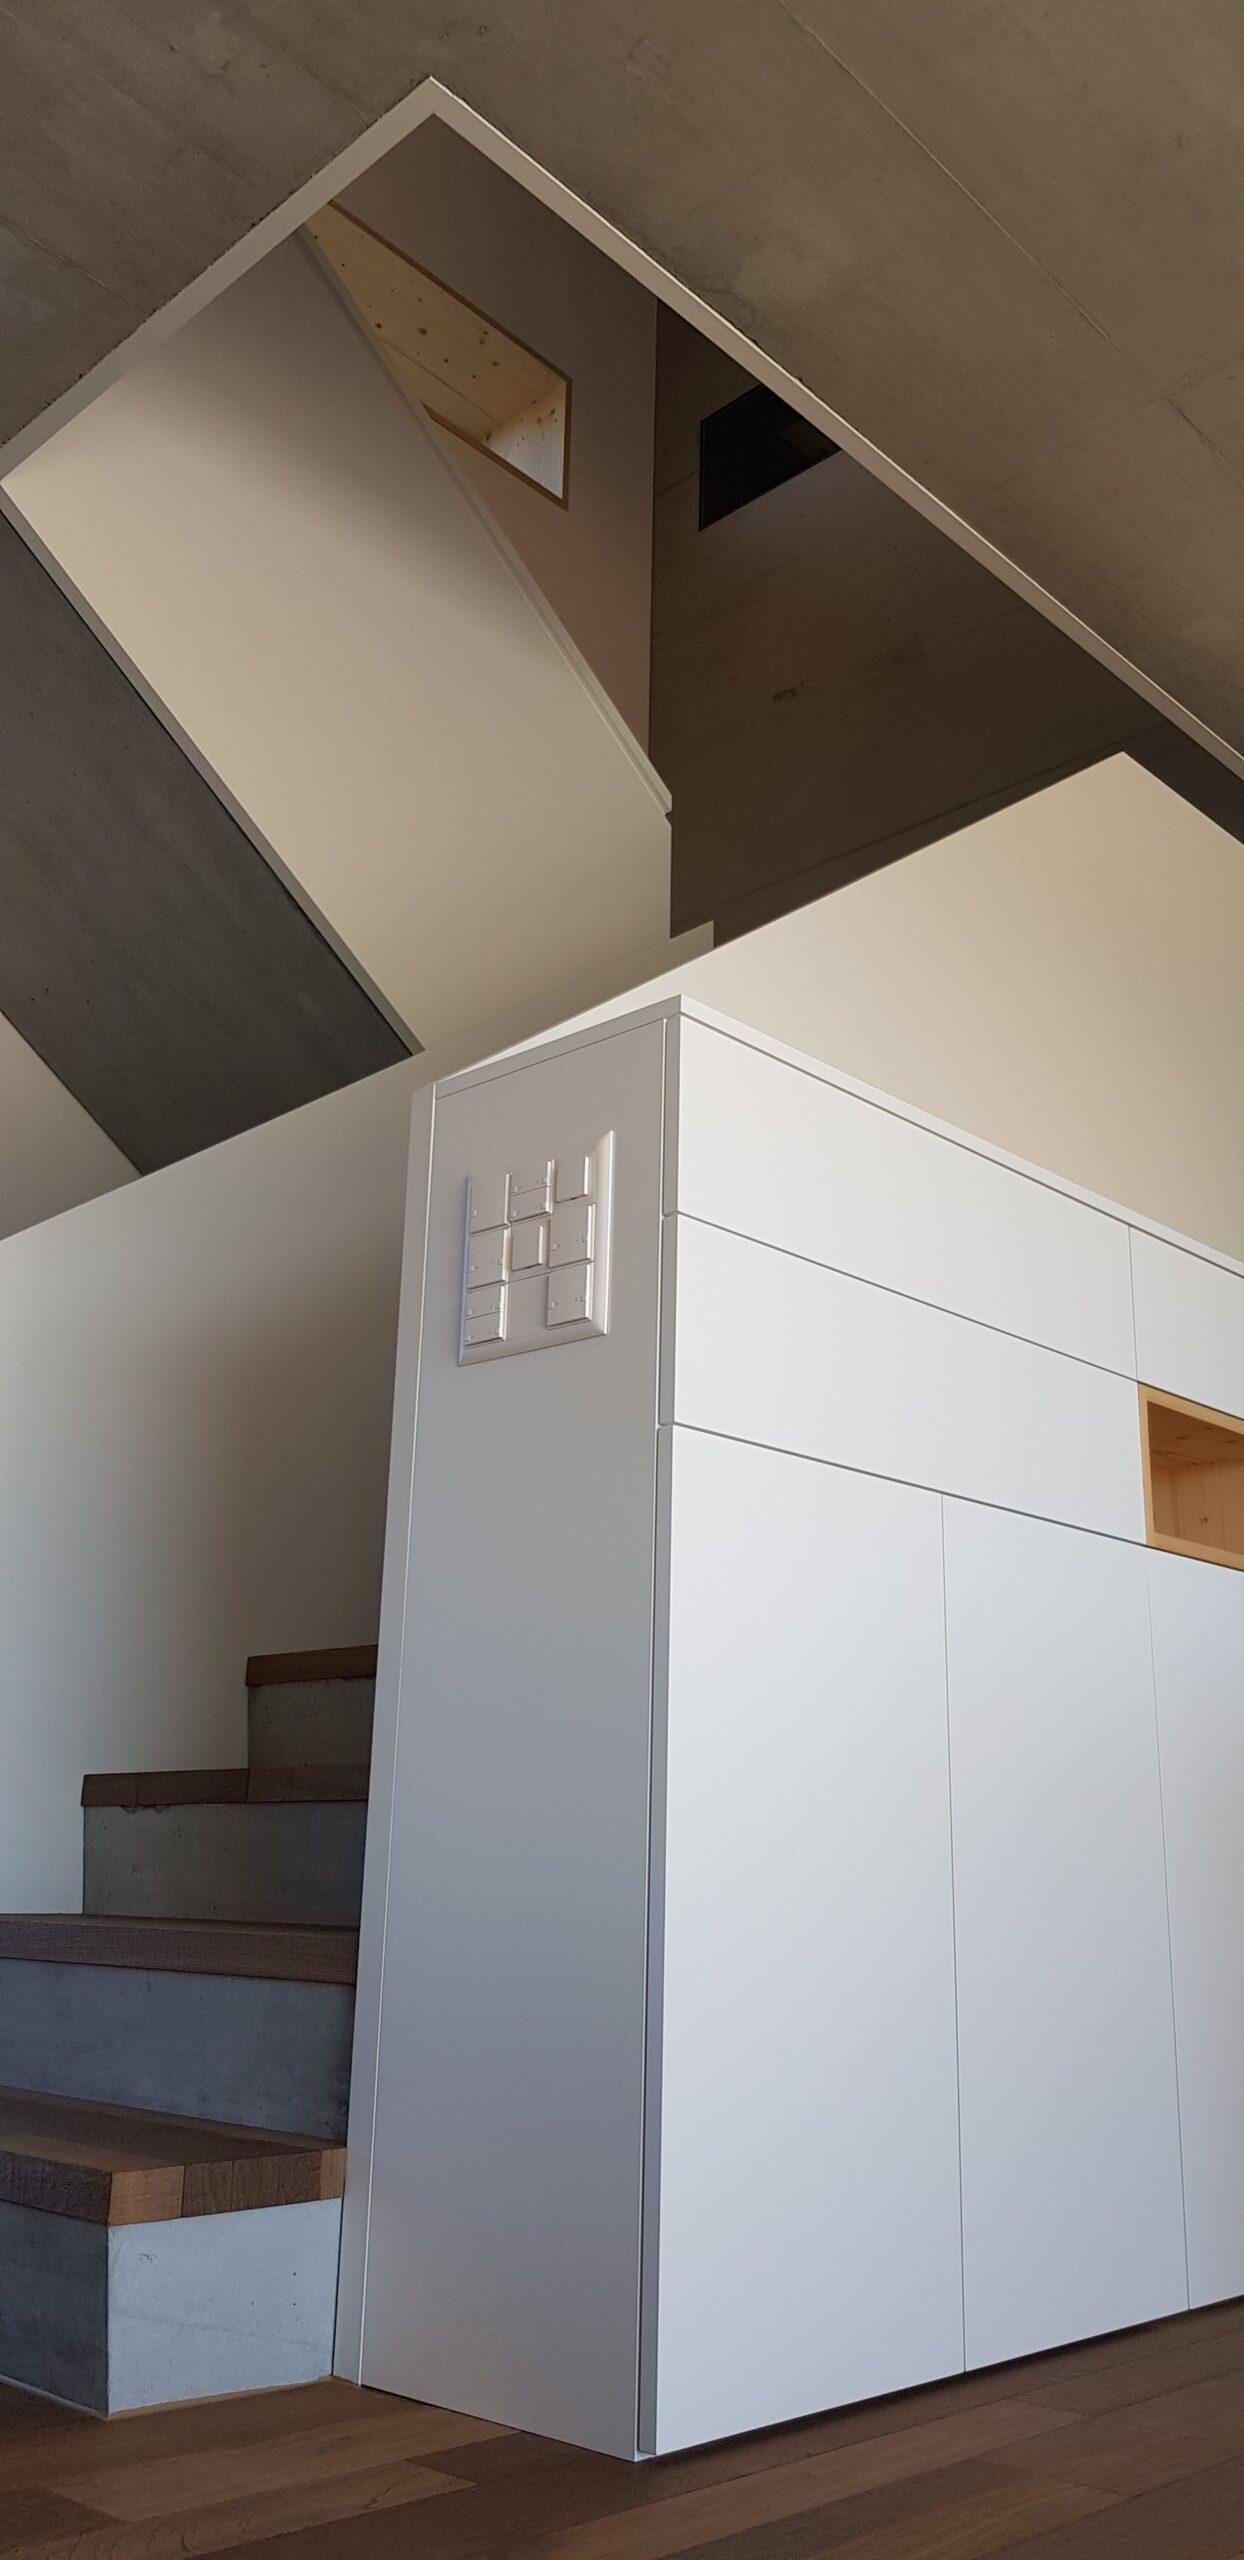 Wooddesign_Treppen_Teppengeländer weiss_Holztreppen_Treppenverkleidung_modern Eiche (13)-min